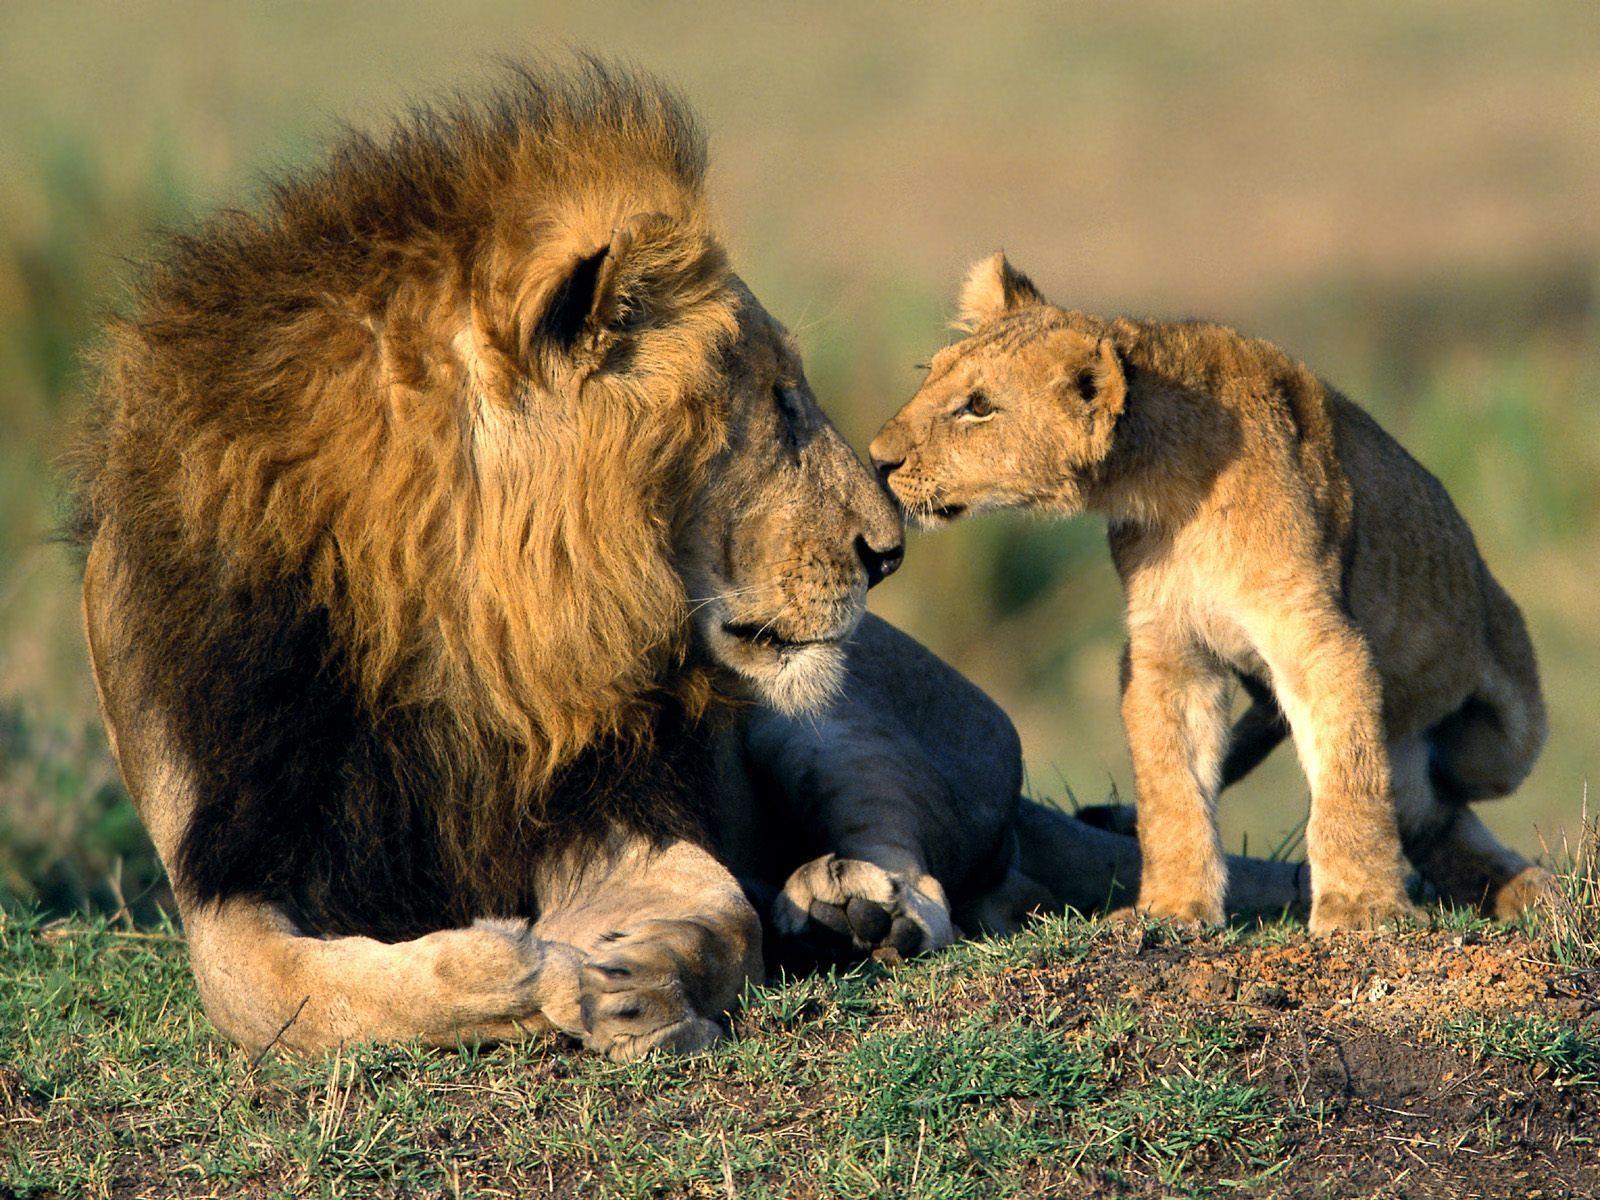 Lion pictures wallpaper - photo#10